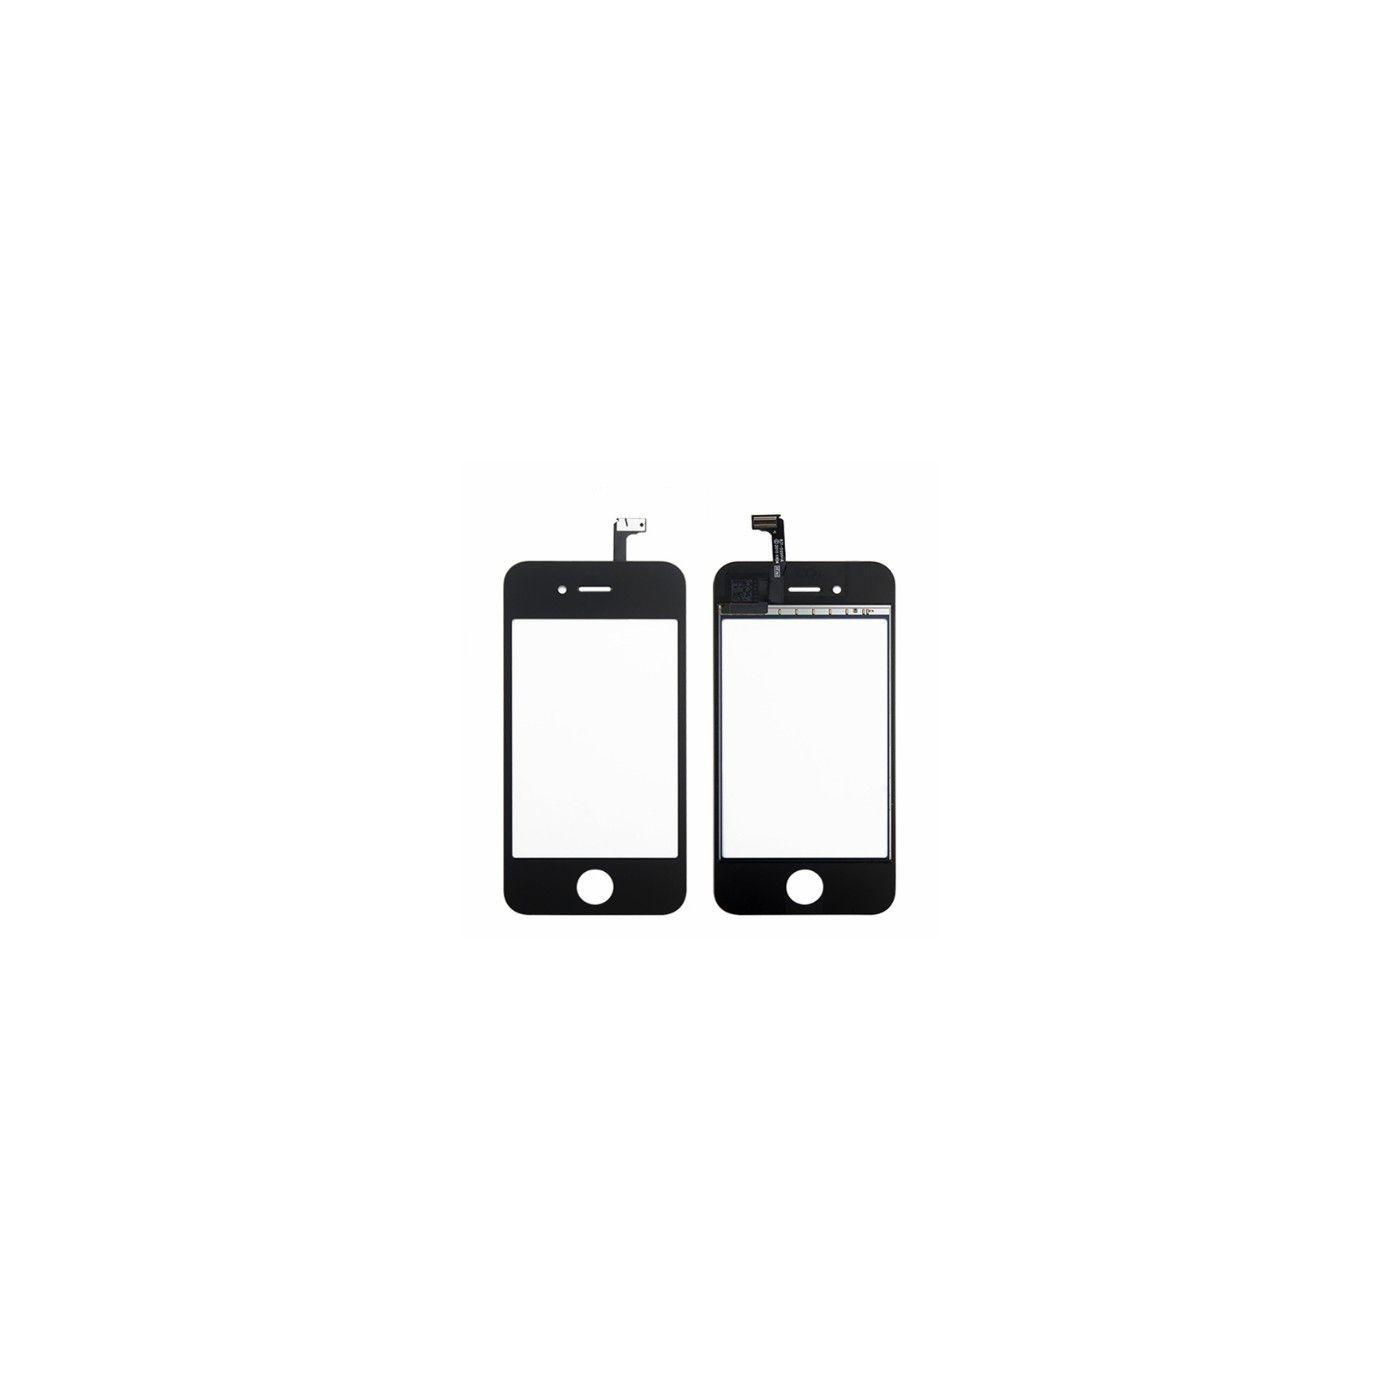 Pantalla táctil de cristal para apple iphone 4 4g pantalla negra + adhesivo de doble cara